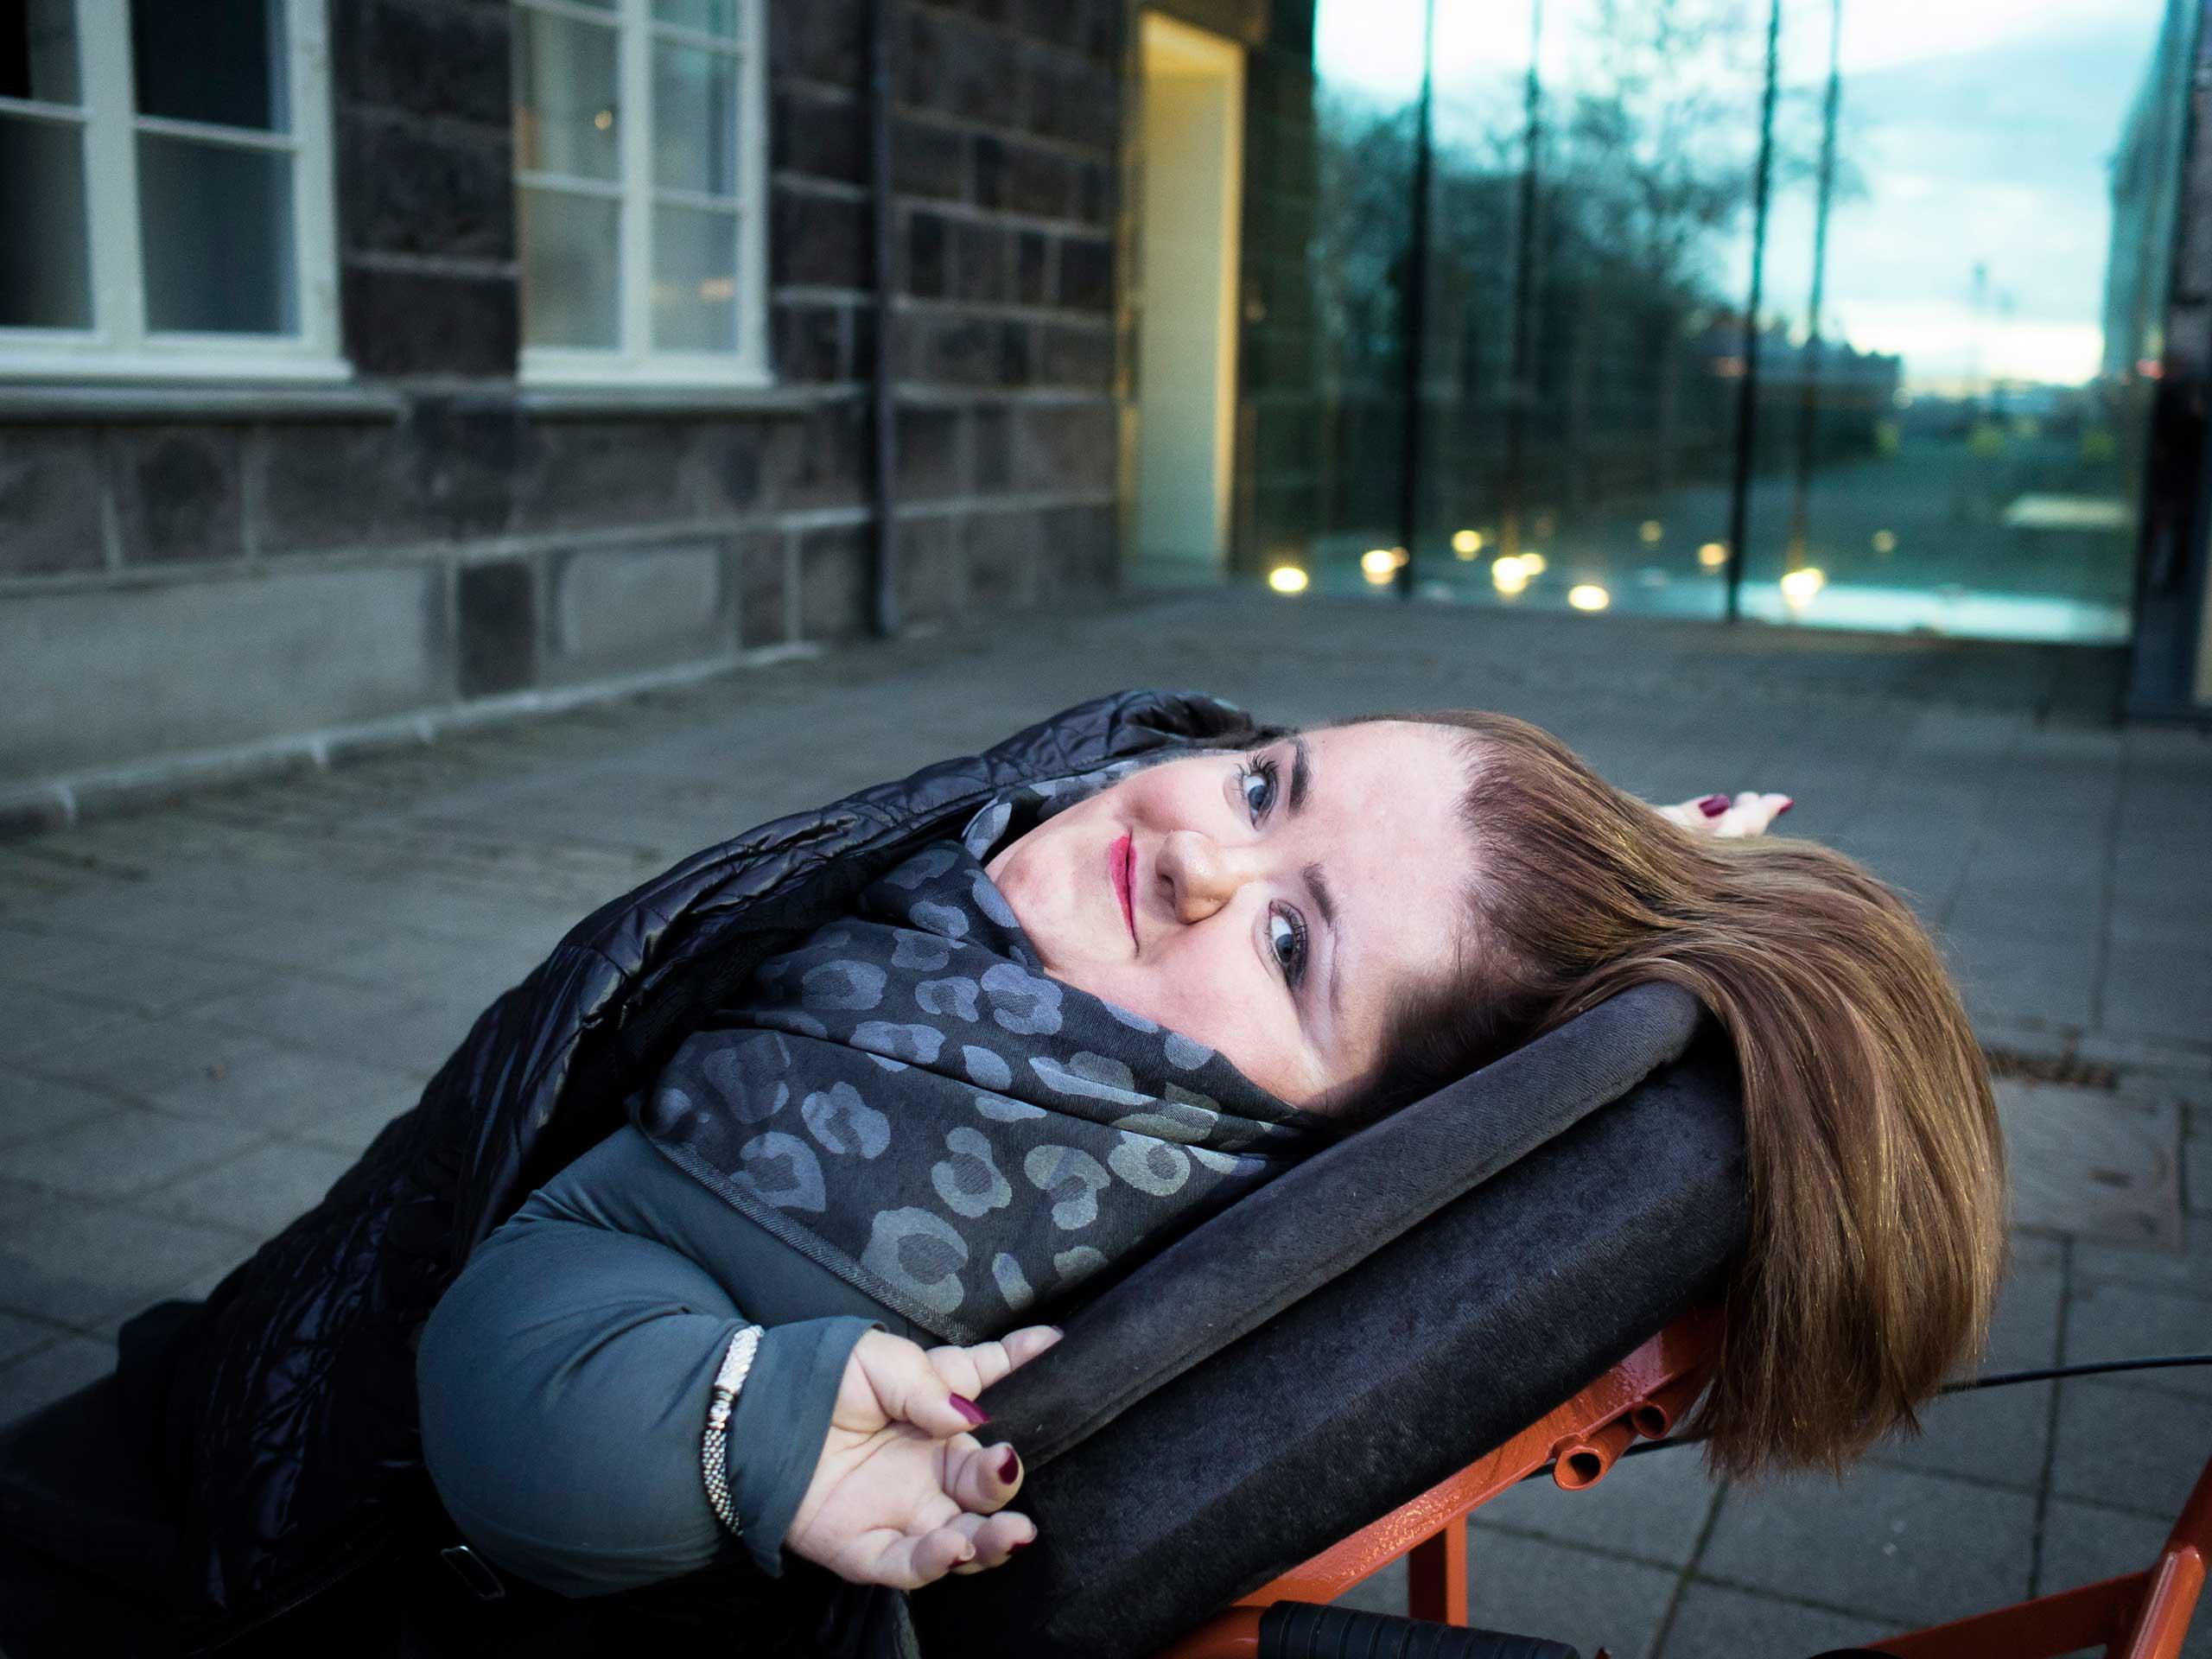 Freyja Haraldsdóttir, MP and disabled rights activist, outside parliament in Reykjavik,  Iceland, 2013.